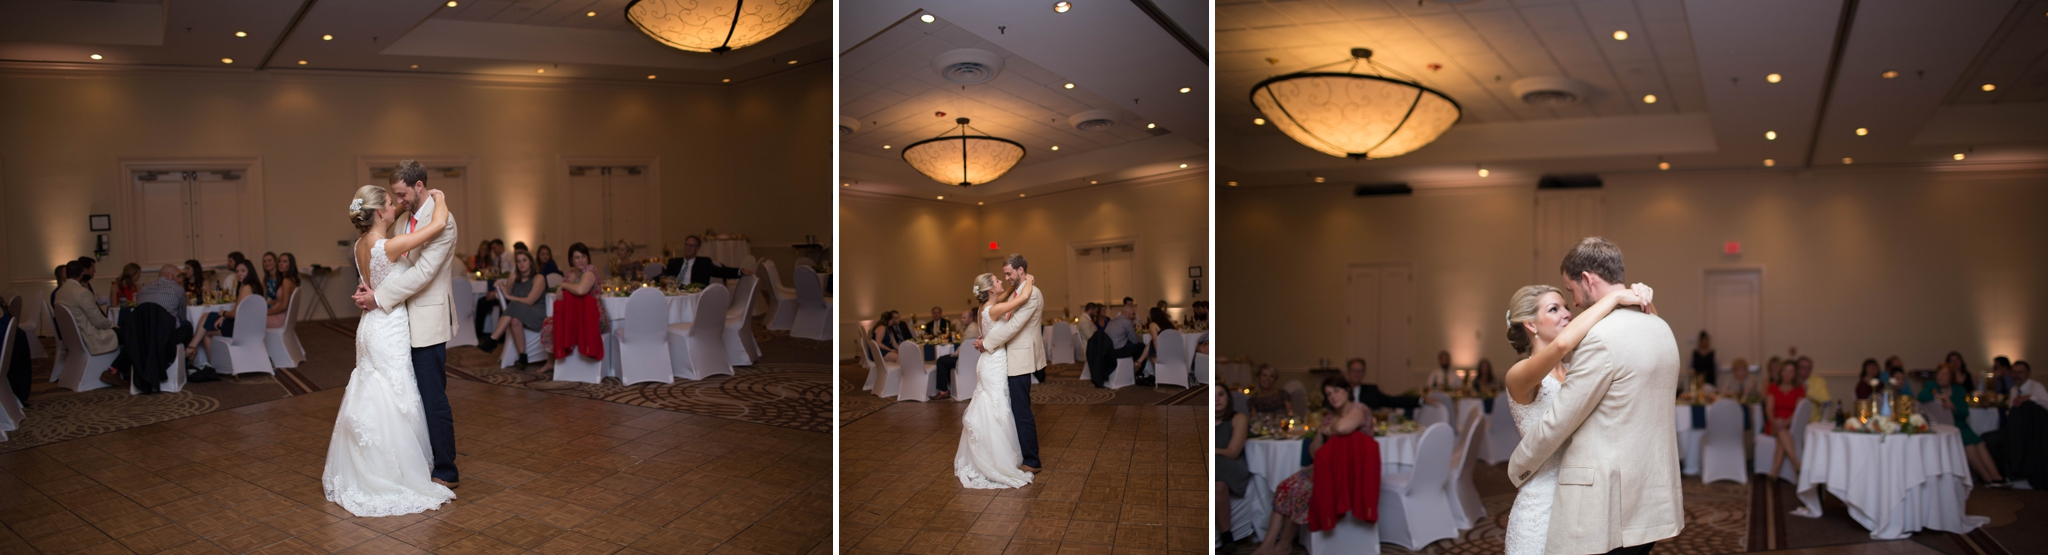 Downtown Raleigh Sheraton Hotel Wedding